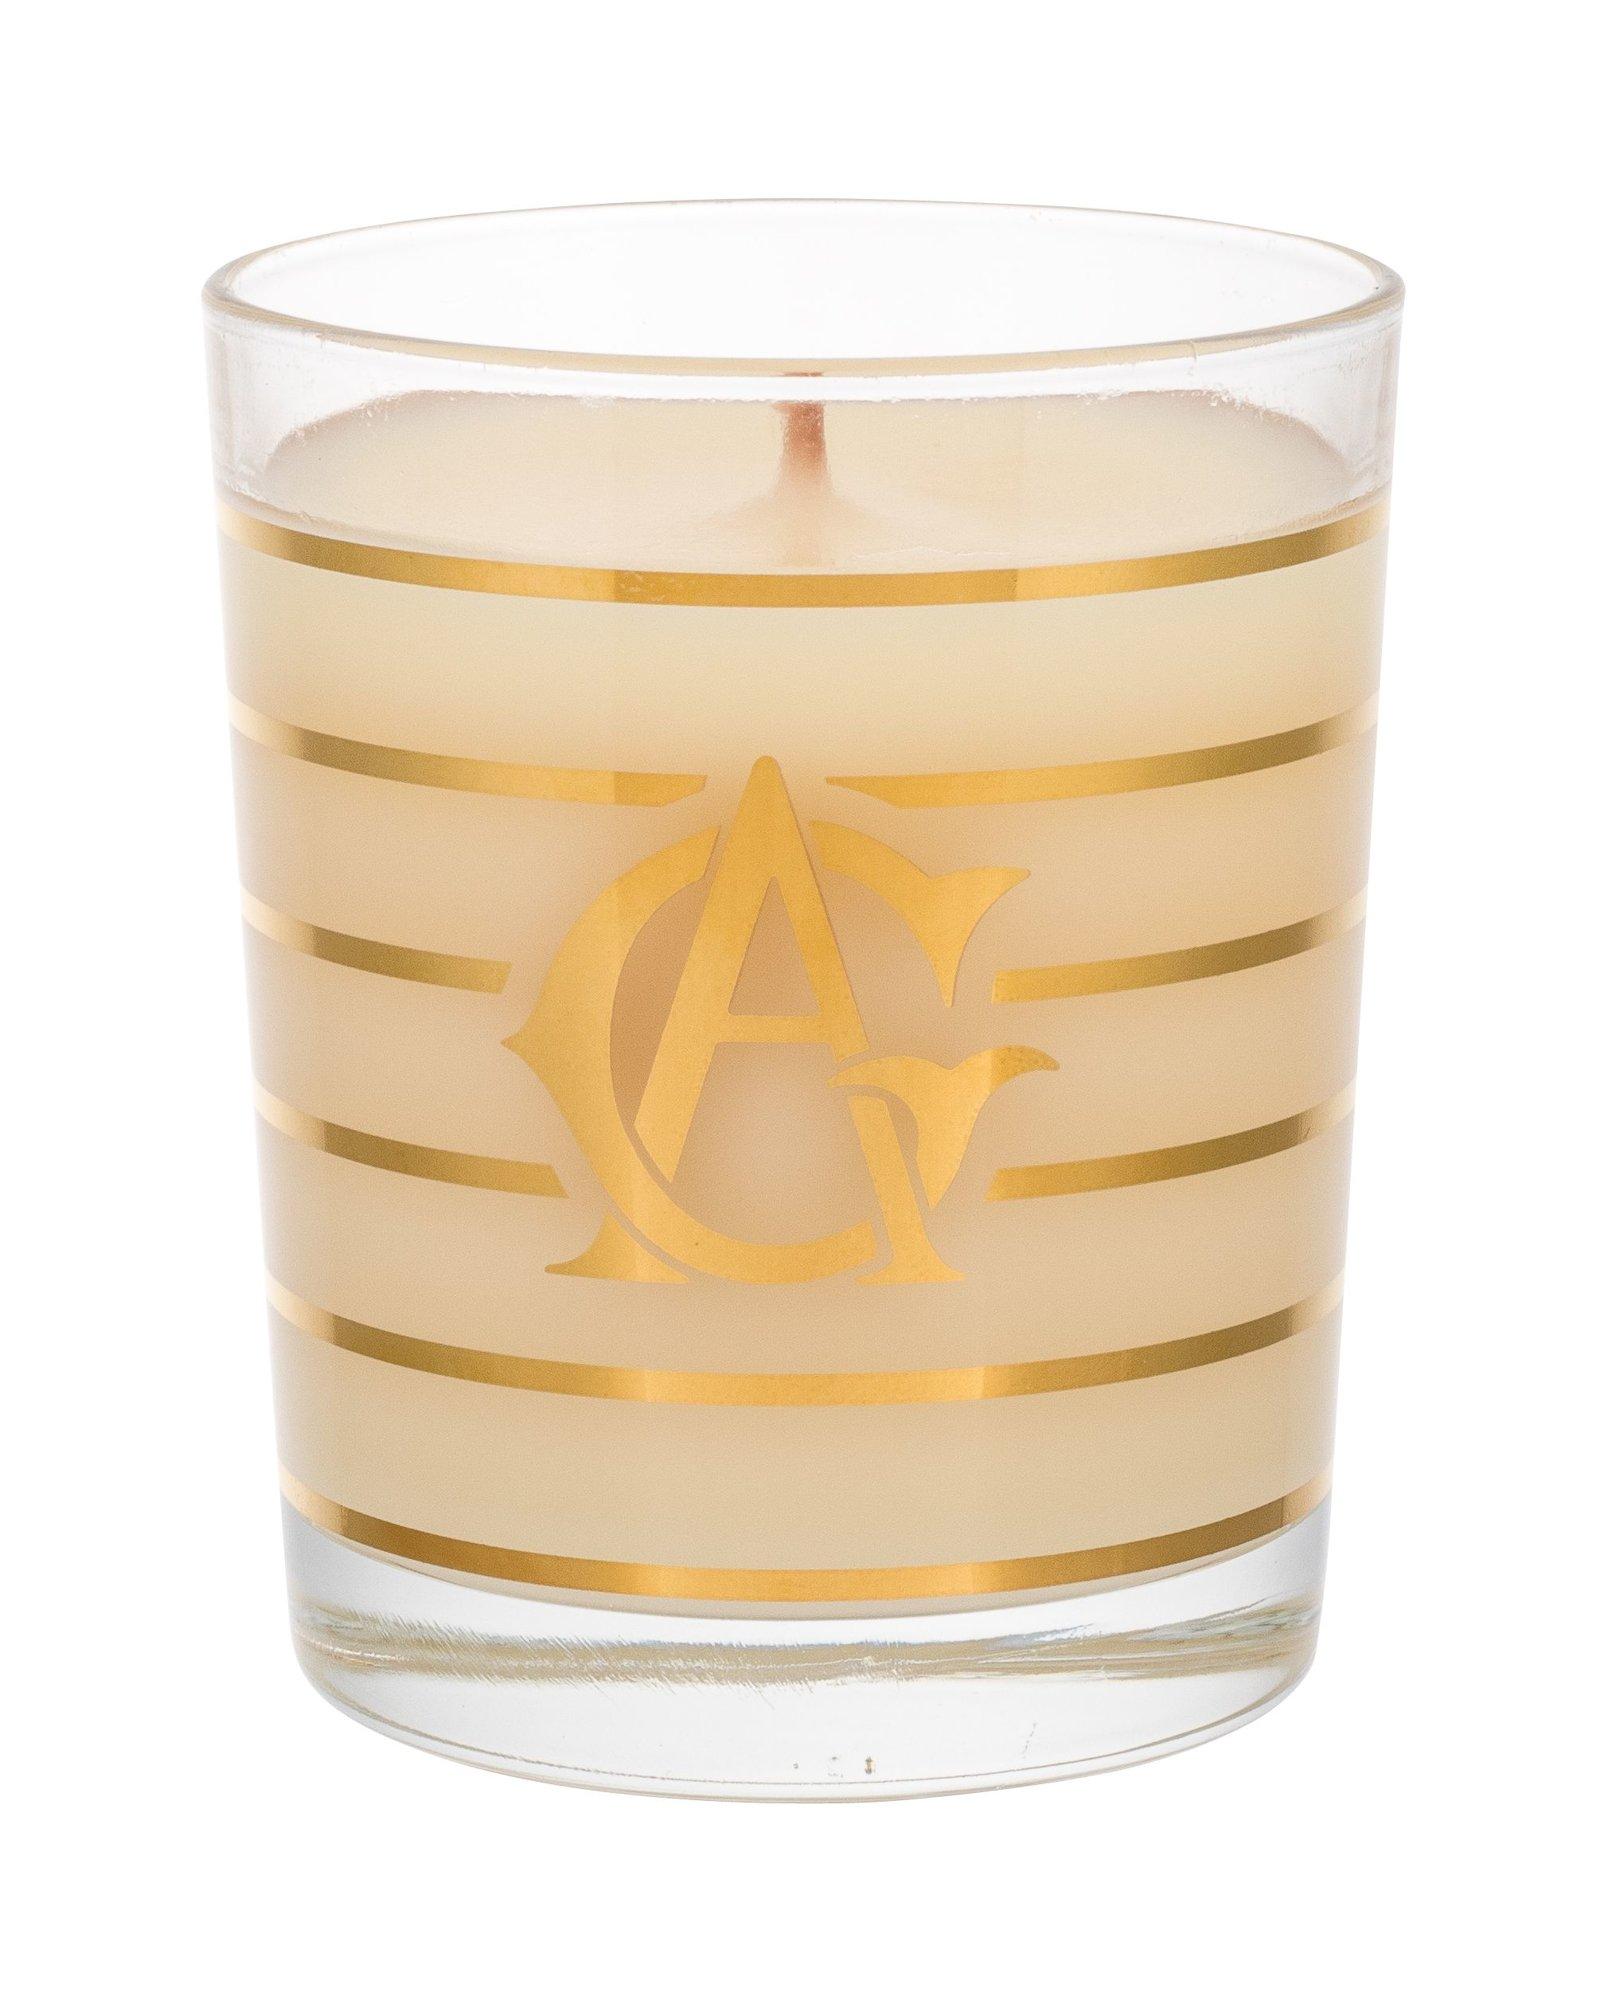 Annick Goutal Ambre Fétiche Scented Candle 175ml